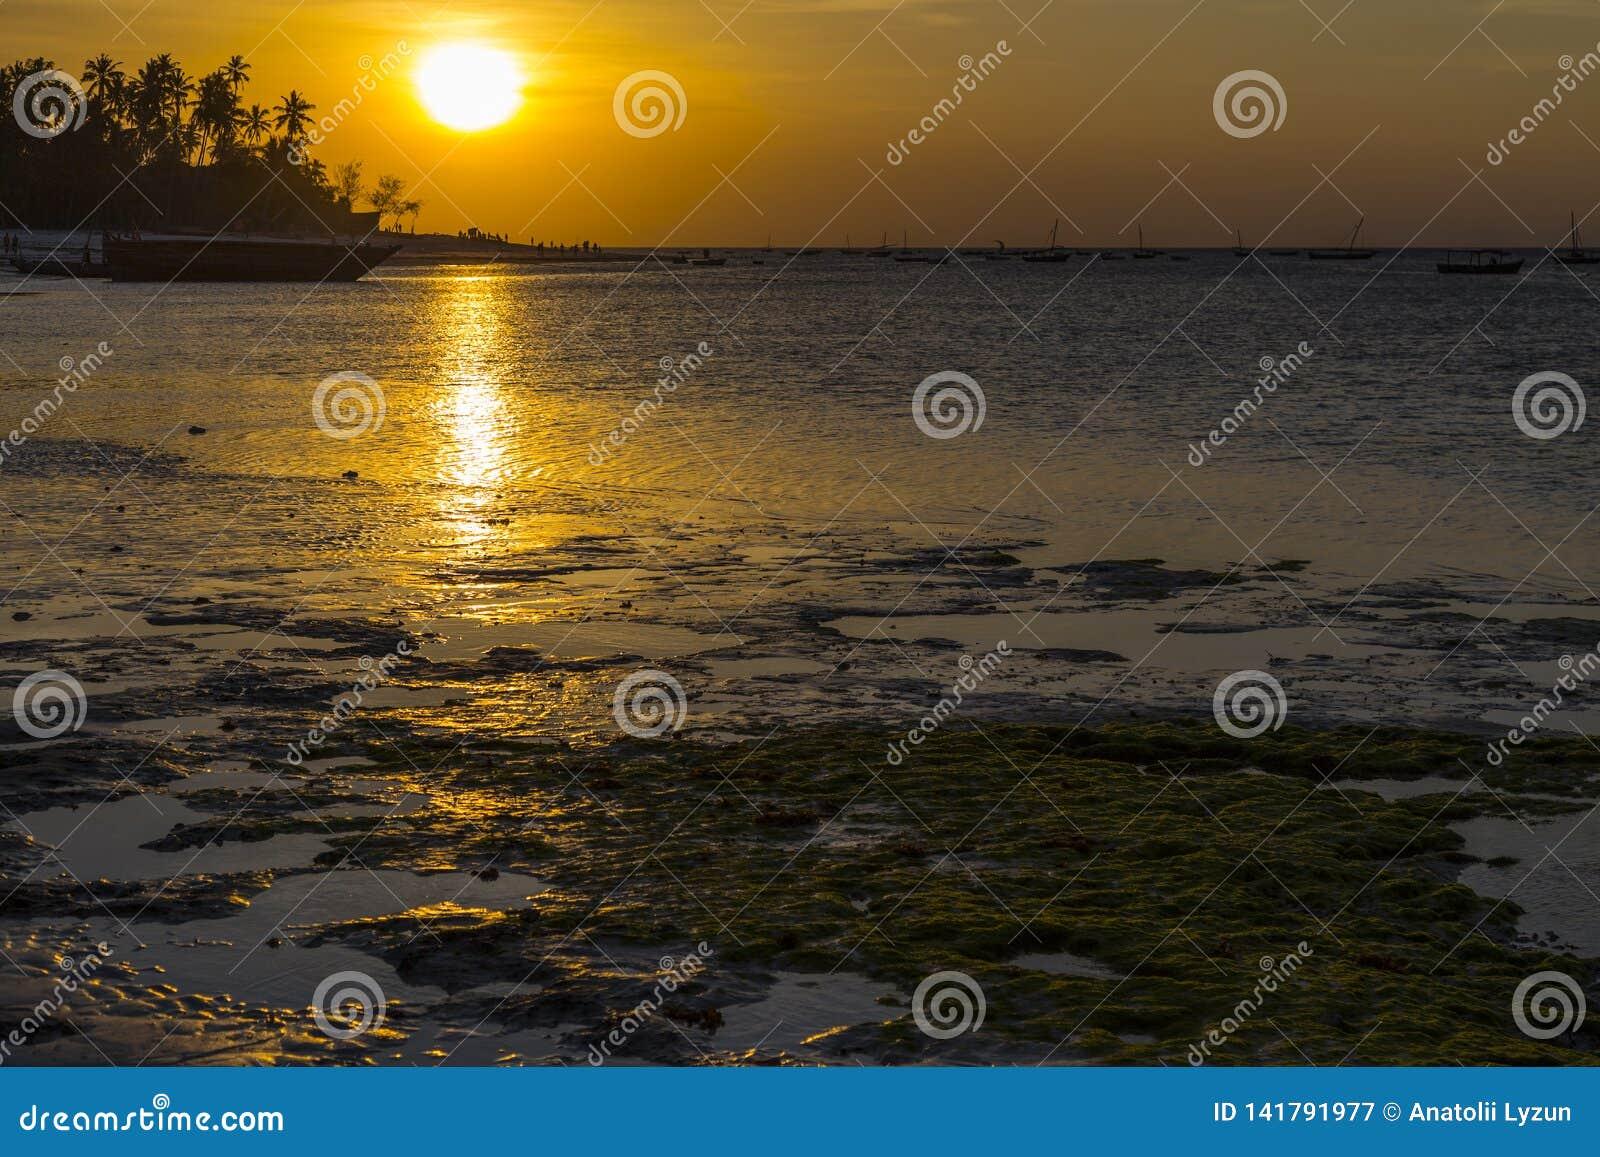 Золотой заход солнца над побережьем океана во время отлива